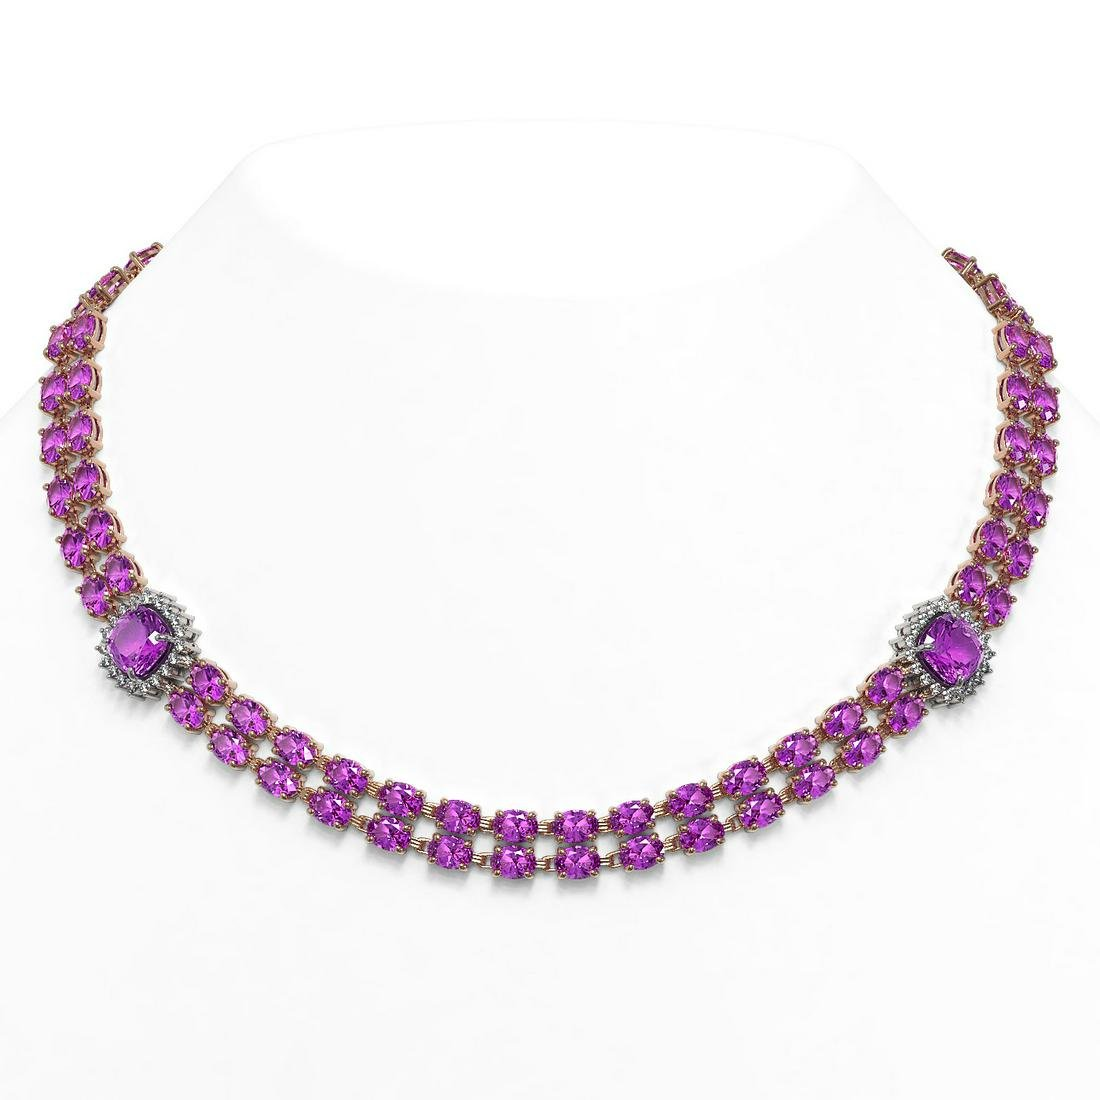 64.81 ctw Amethyst & Diamond Necklace 14K Rose Gold -